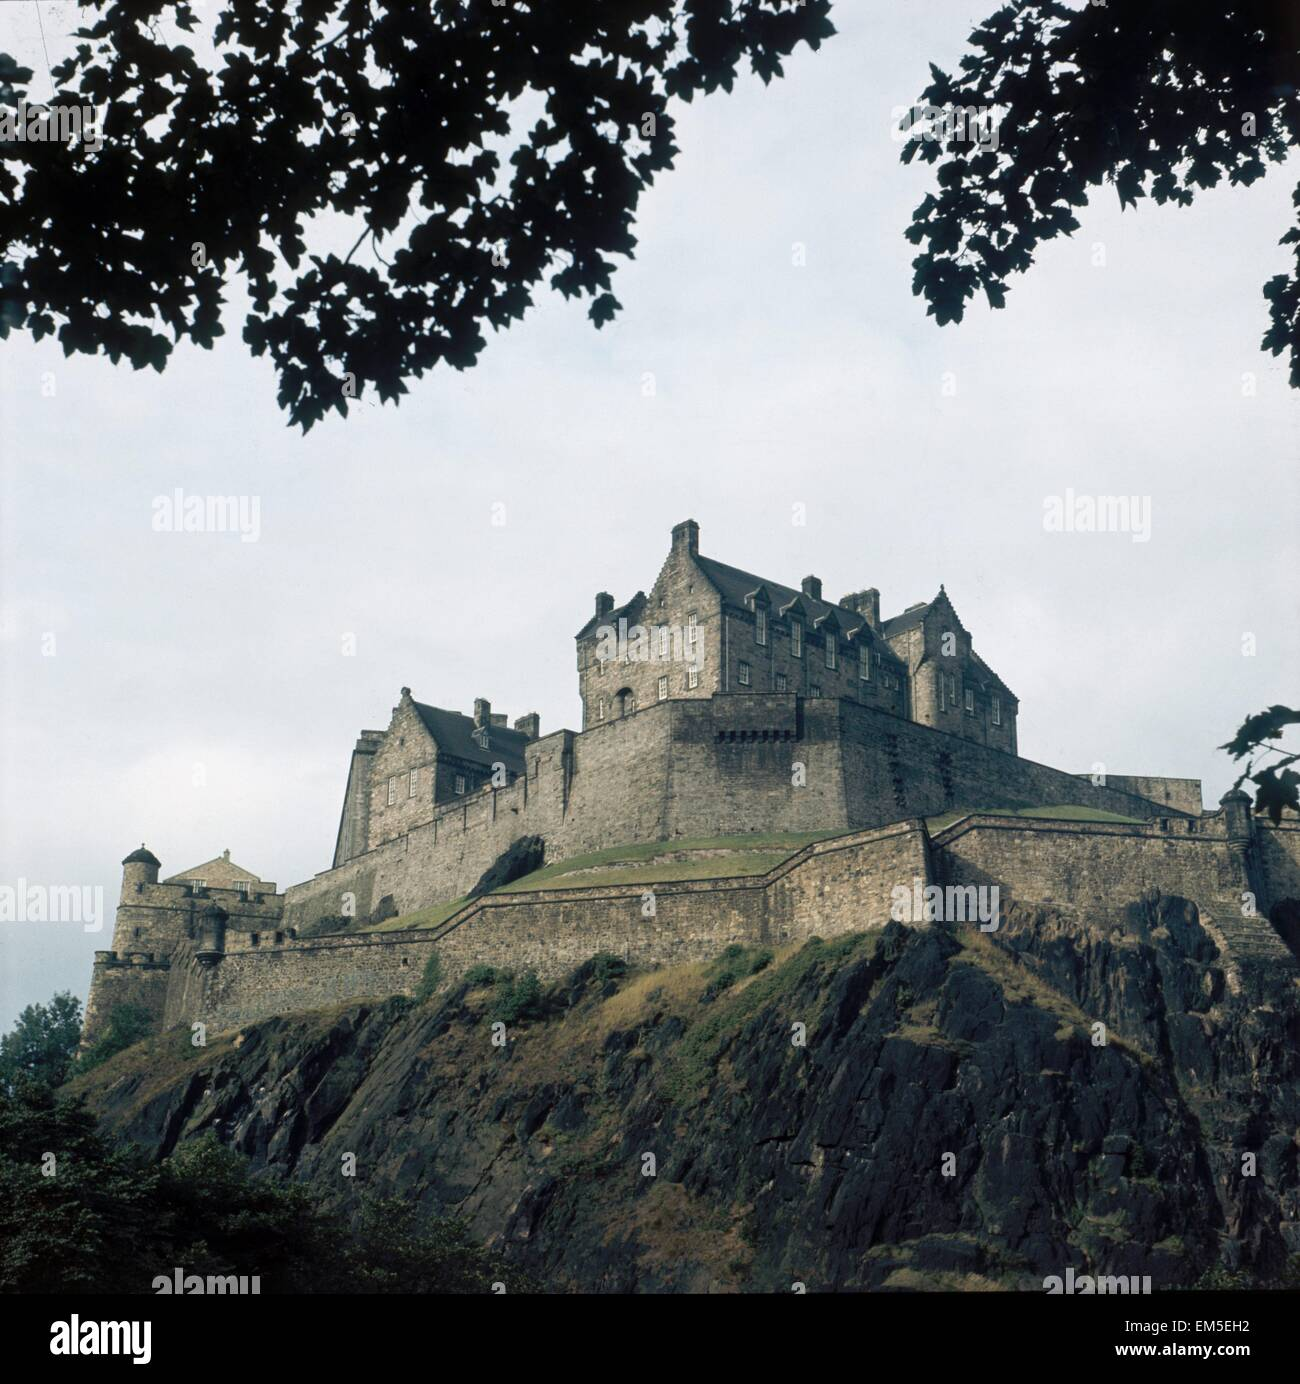 Edinburgh Castle, Scotland circa 1975 - Stock Image